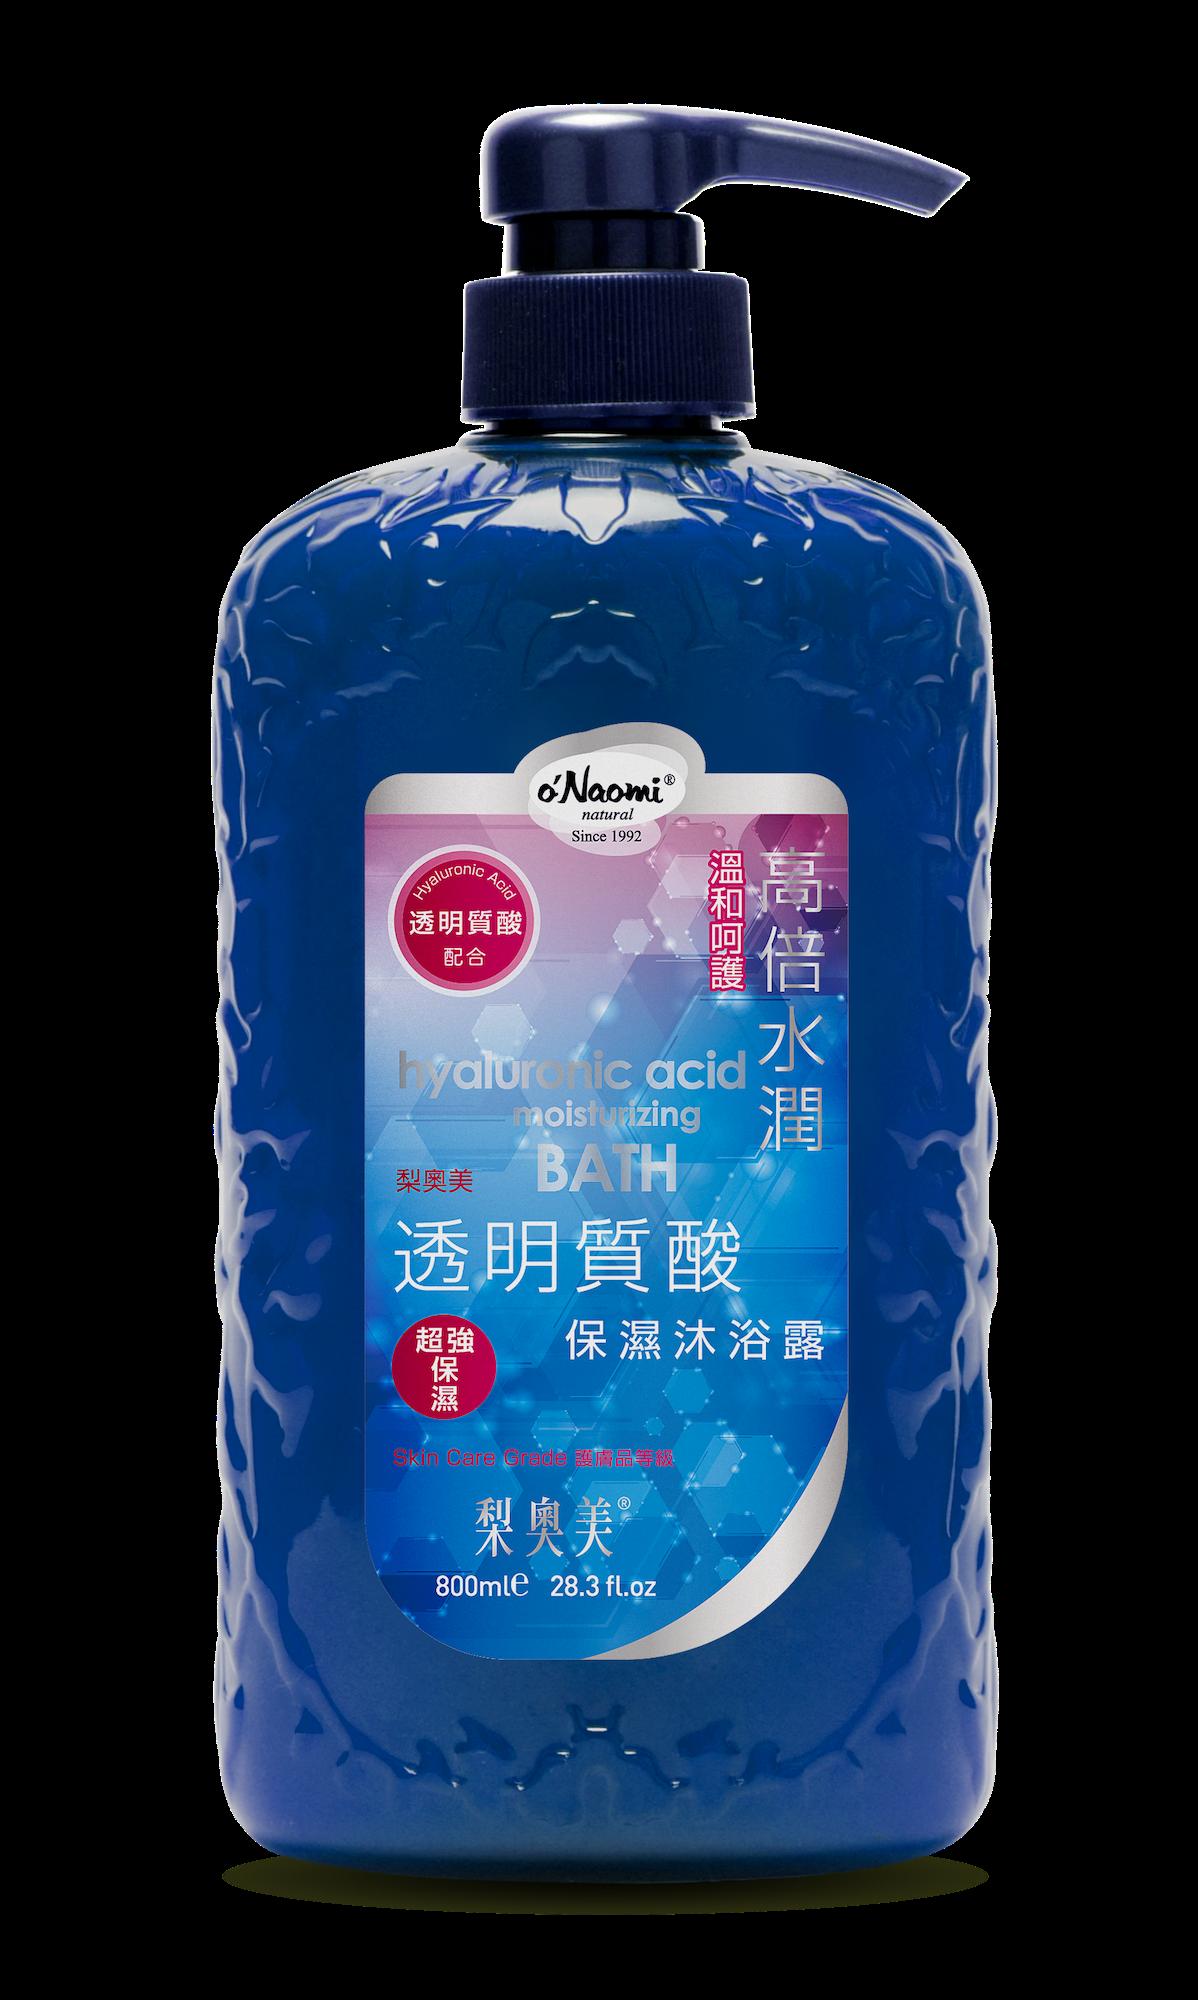 Onaomi Hyaluronic Acid Bath Mockup